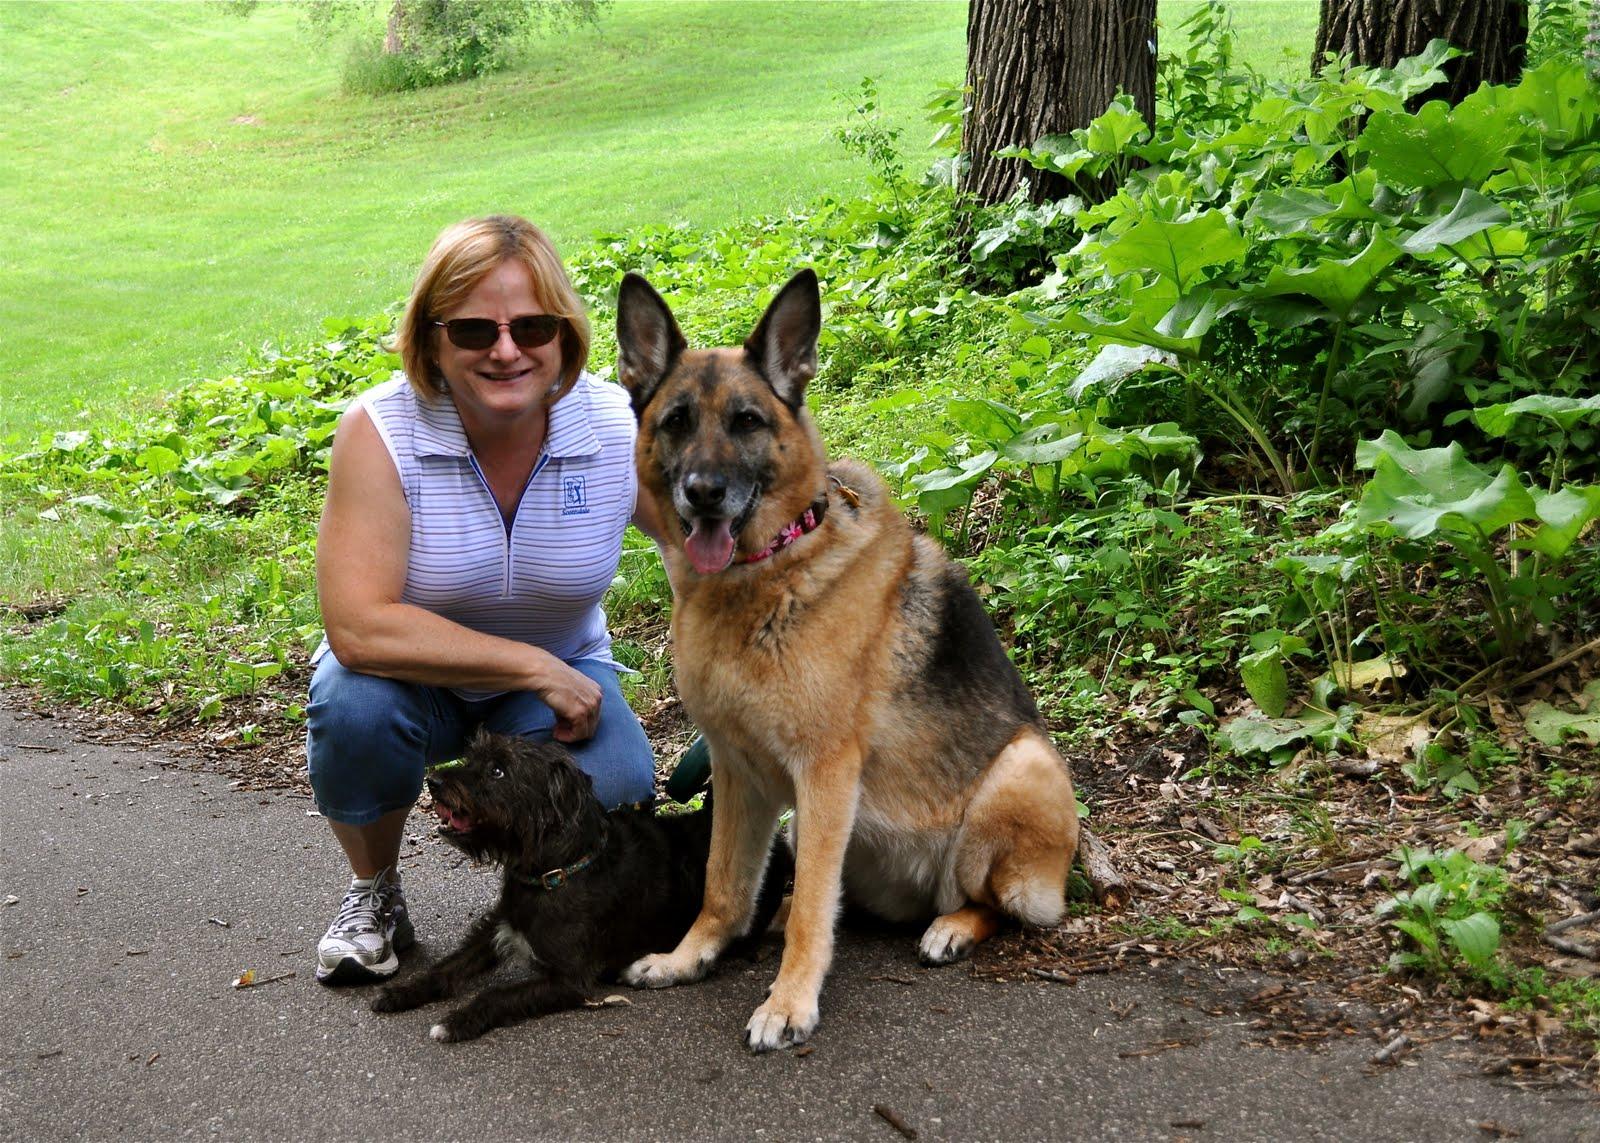 Shepherd Terrier Mix - Dog Training Home | Dog Types